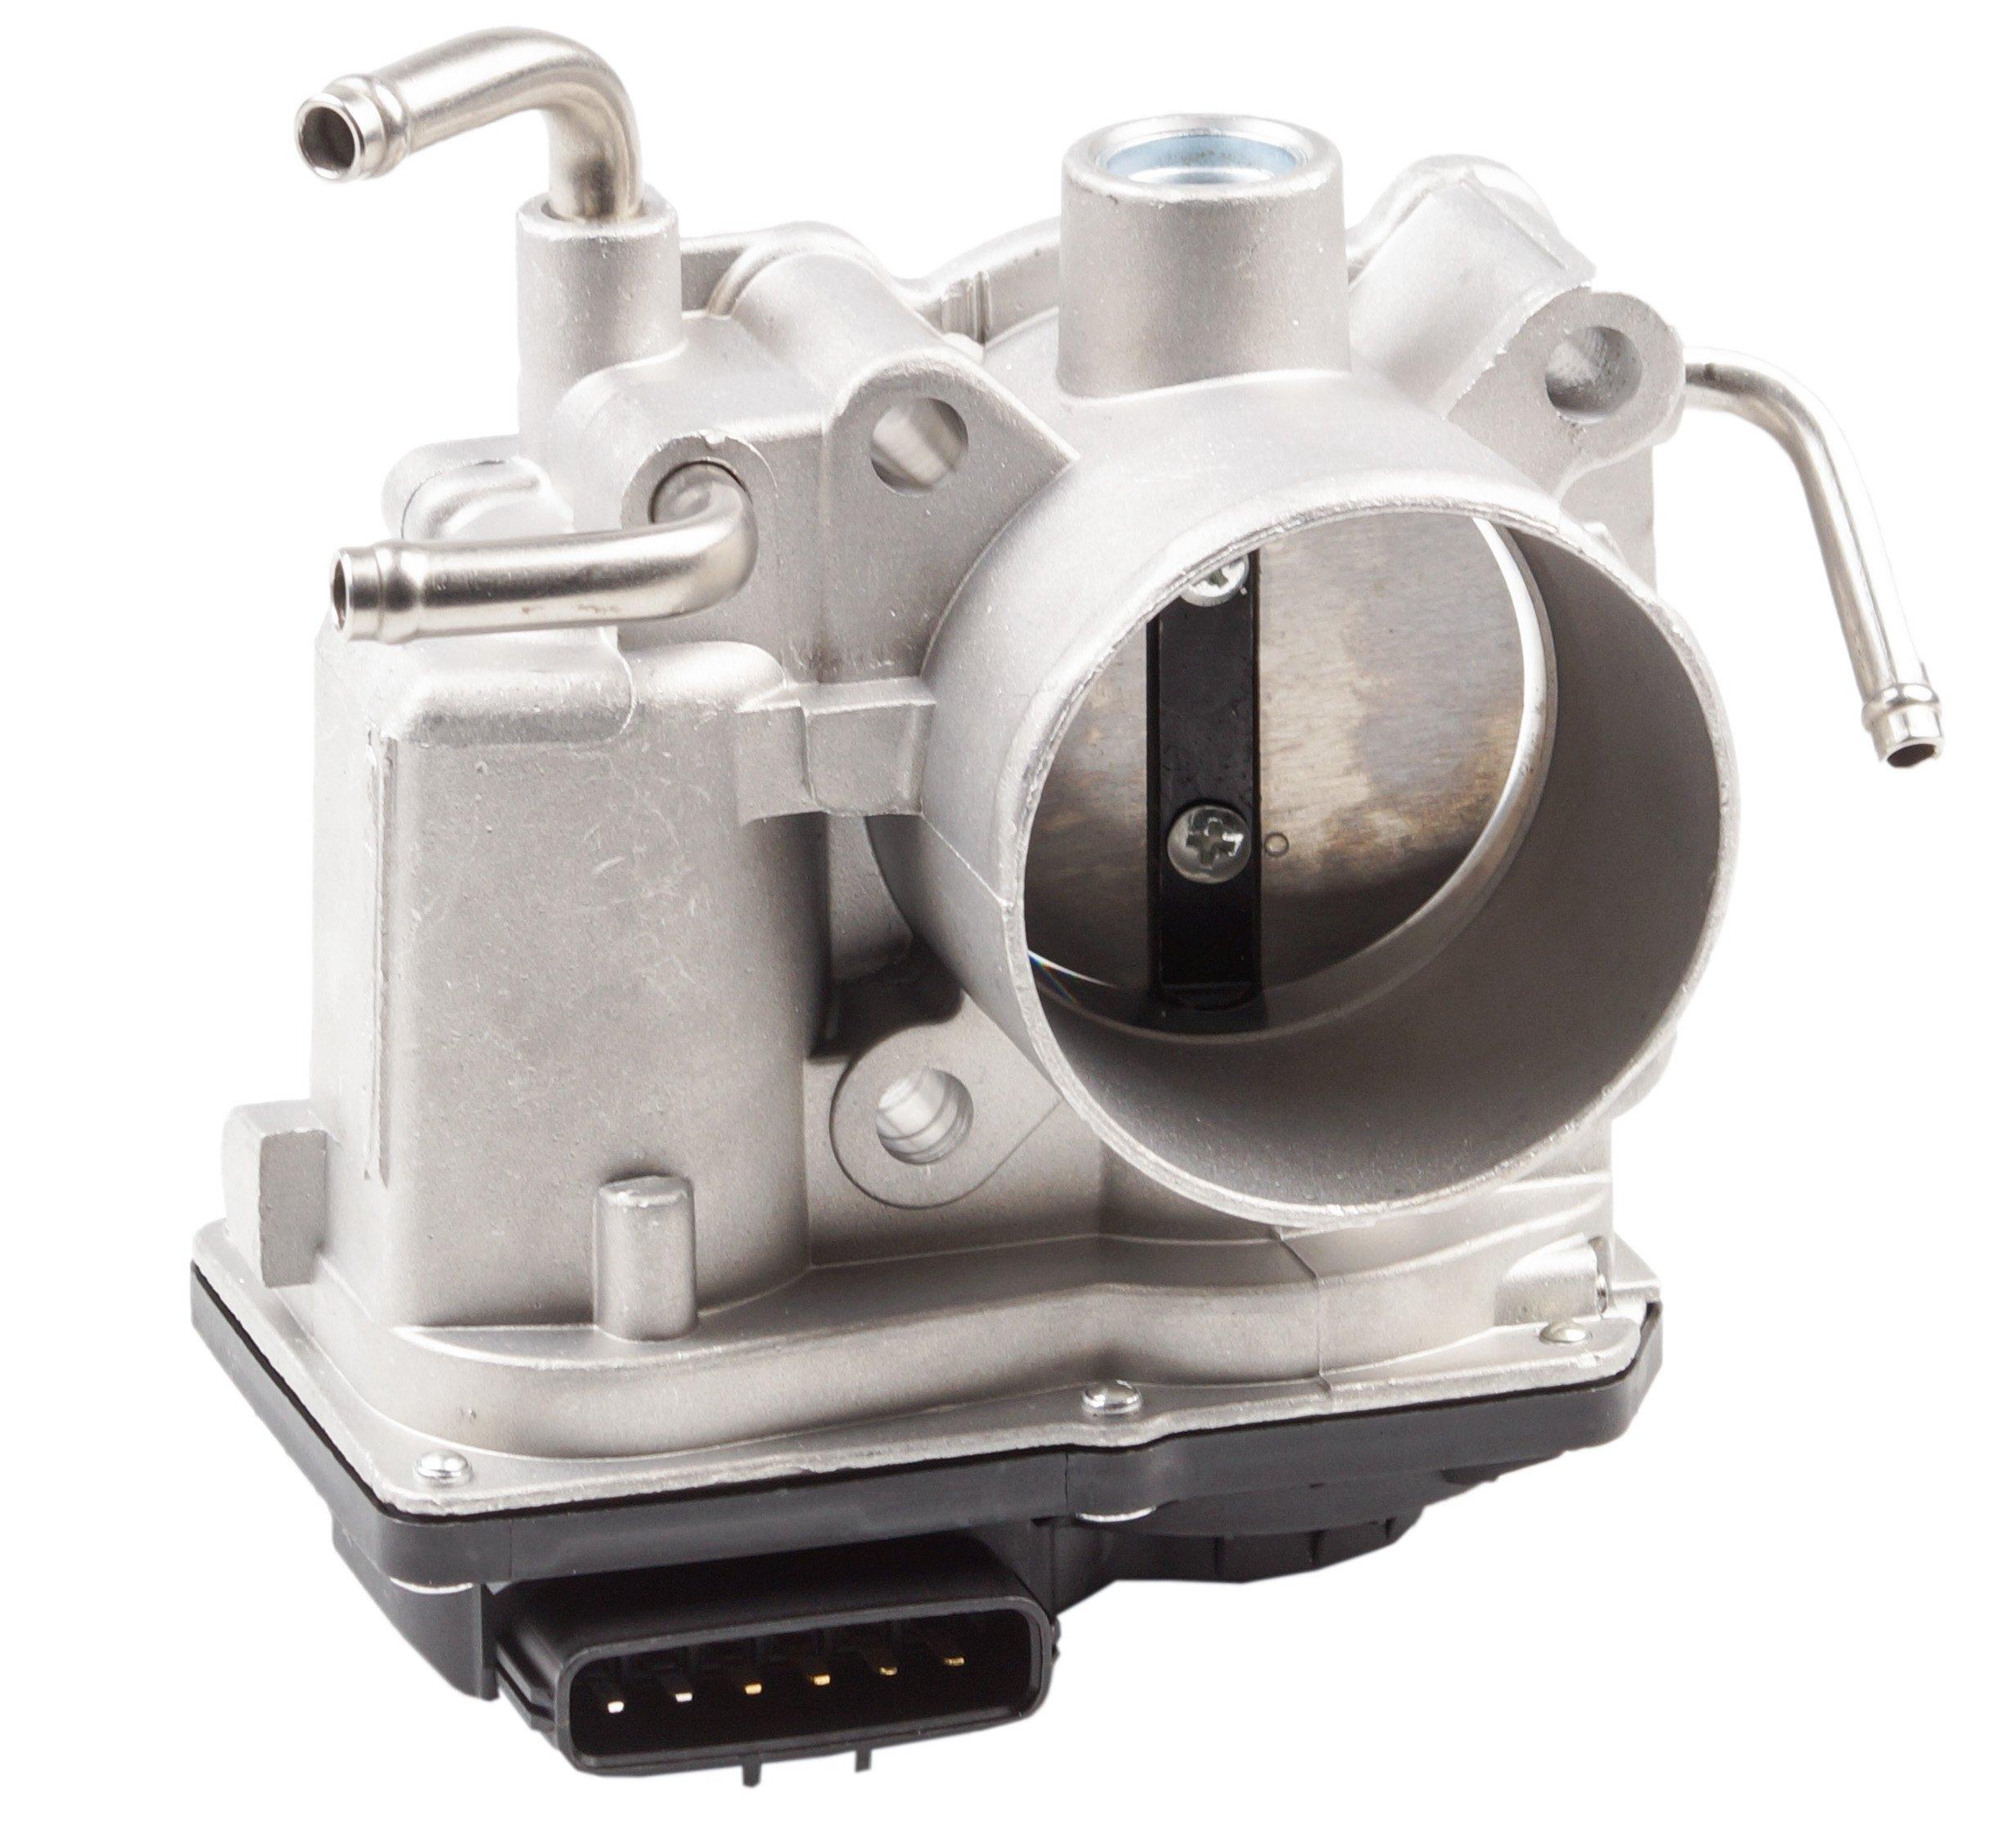 Bapmic 22030-0H021 Throttle Body Assembly for Toyota Camry Highlander RAV4 Solara Scion Tc